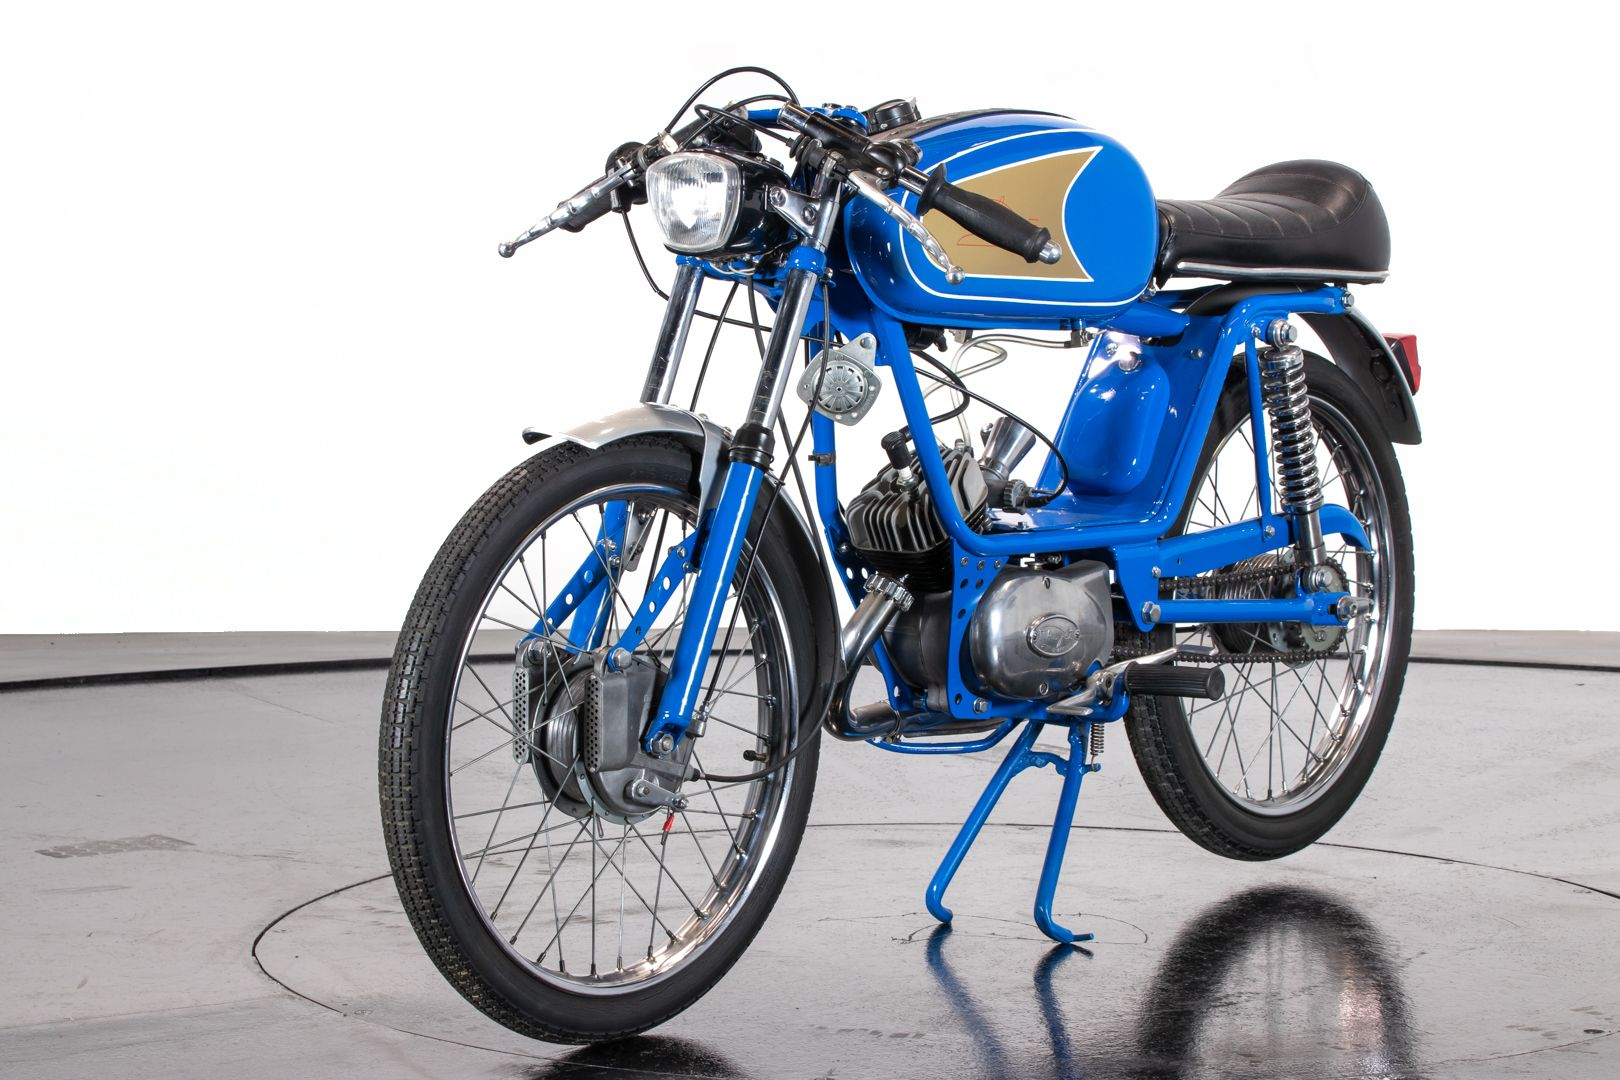 1970 ITALJET 50 58527